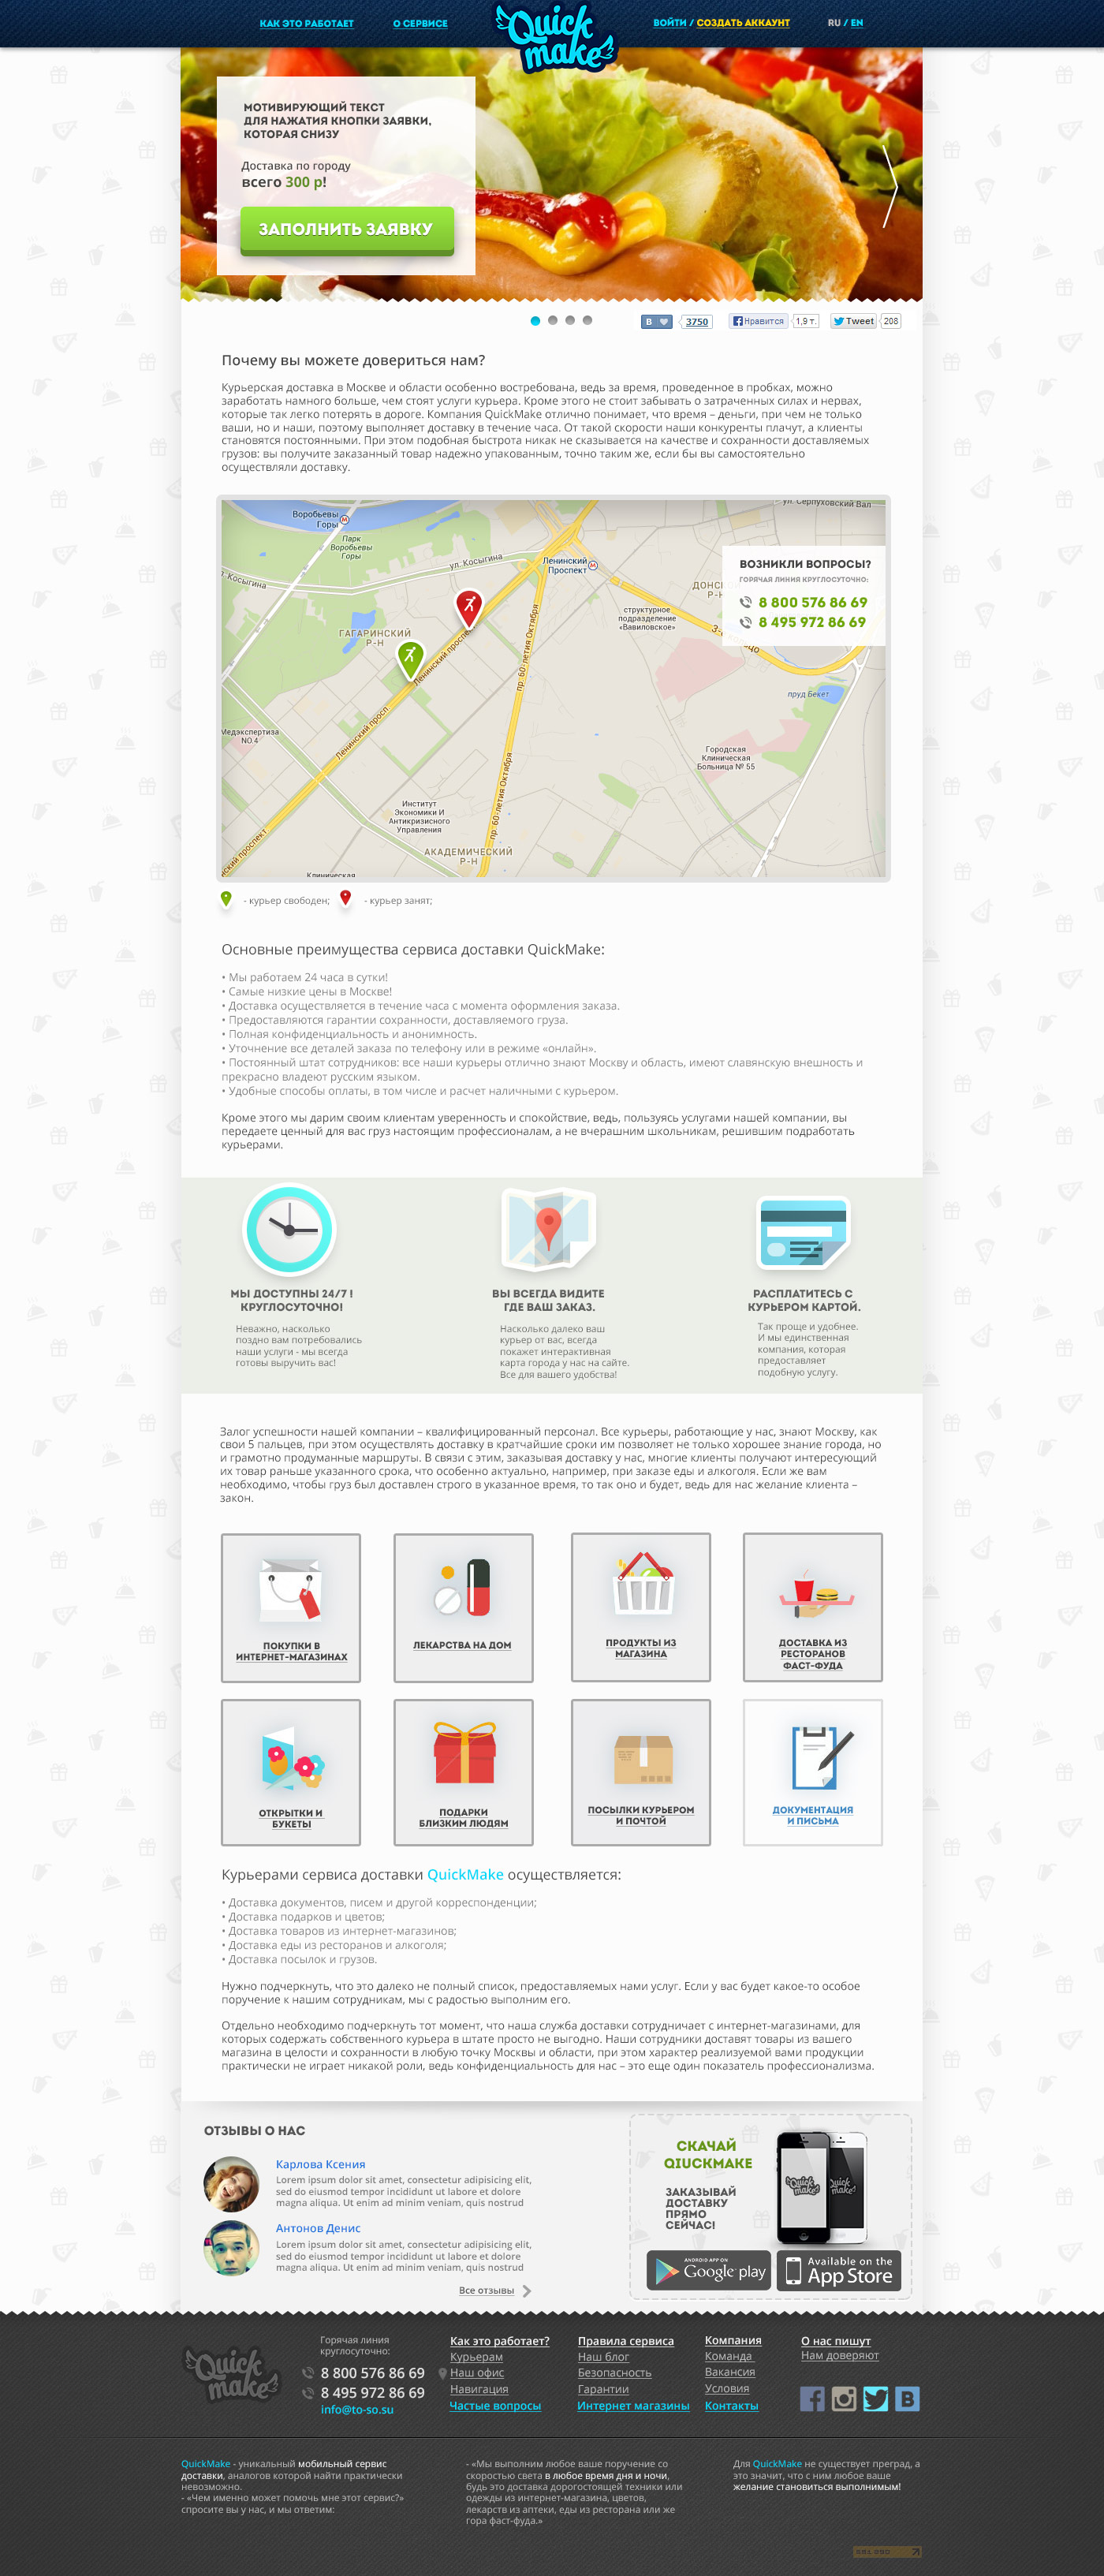 Дизайн сайта QuickMake